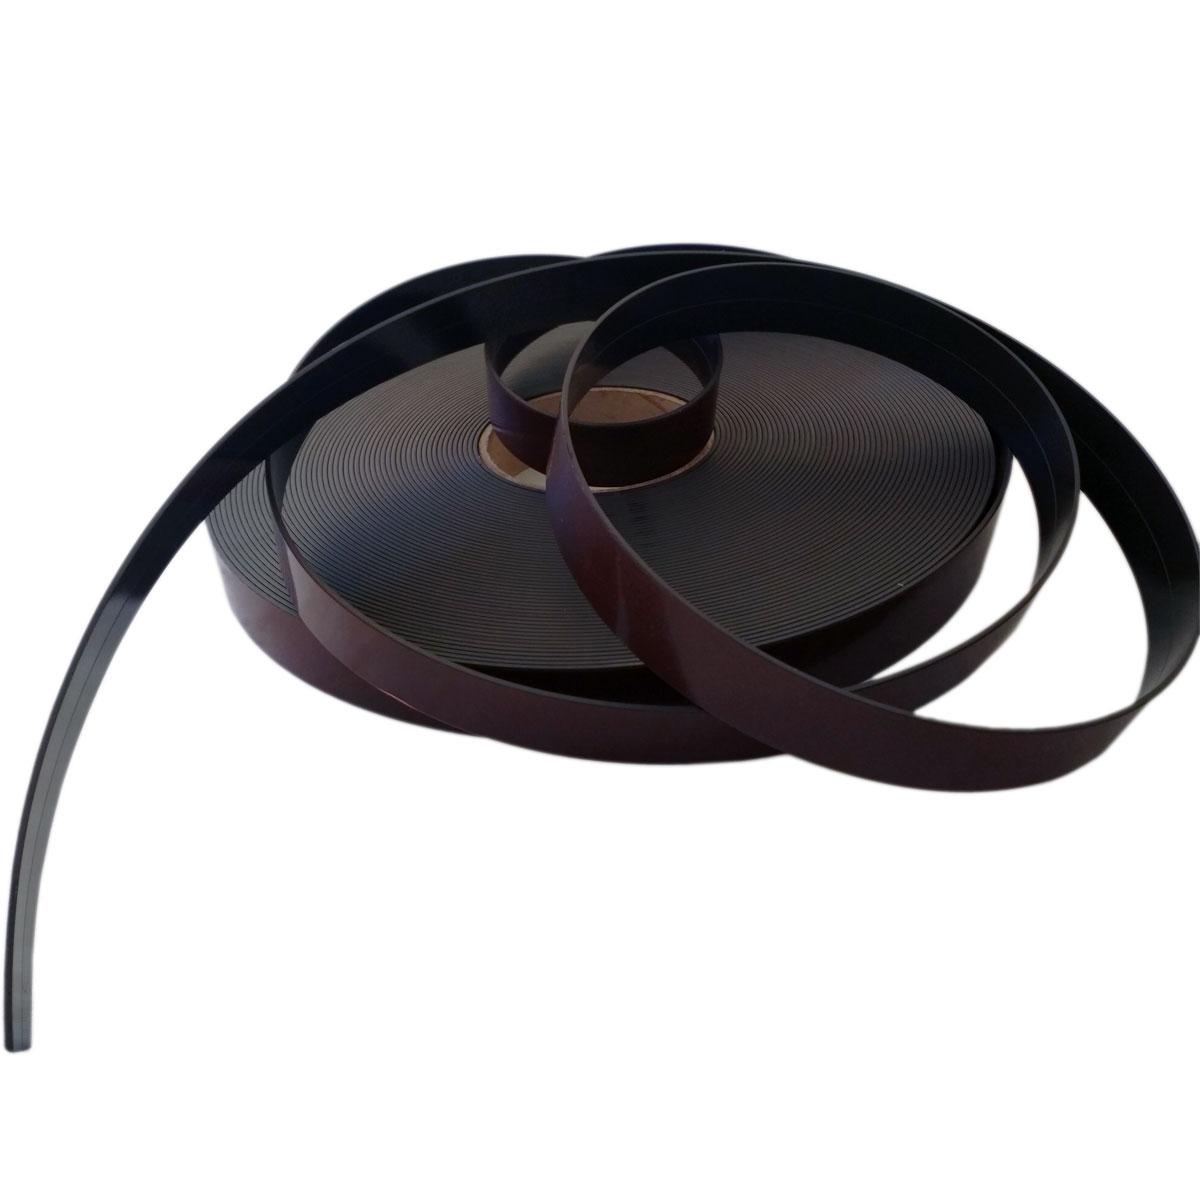 Self-adhesive magnetic tape with Premium glue